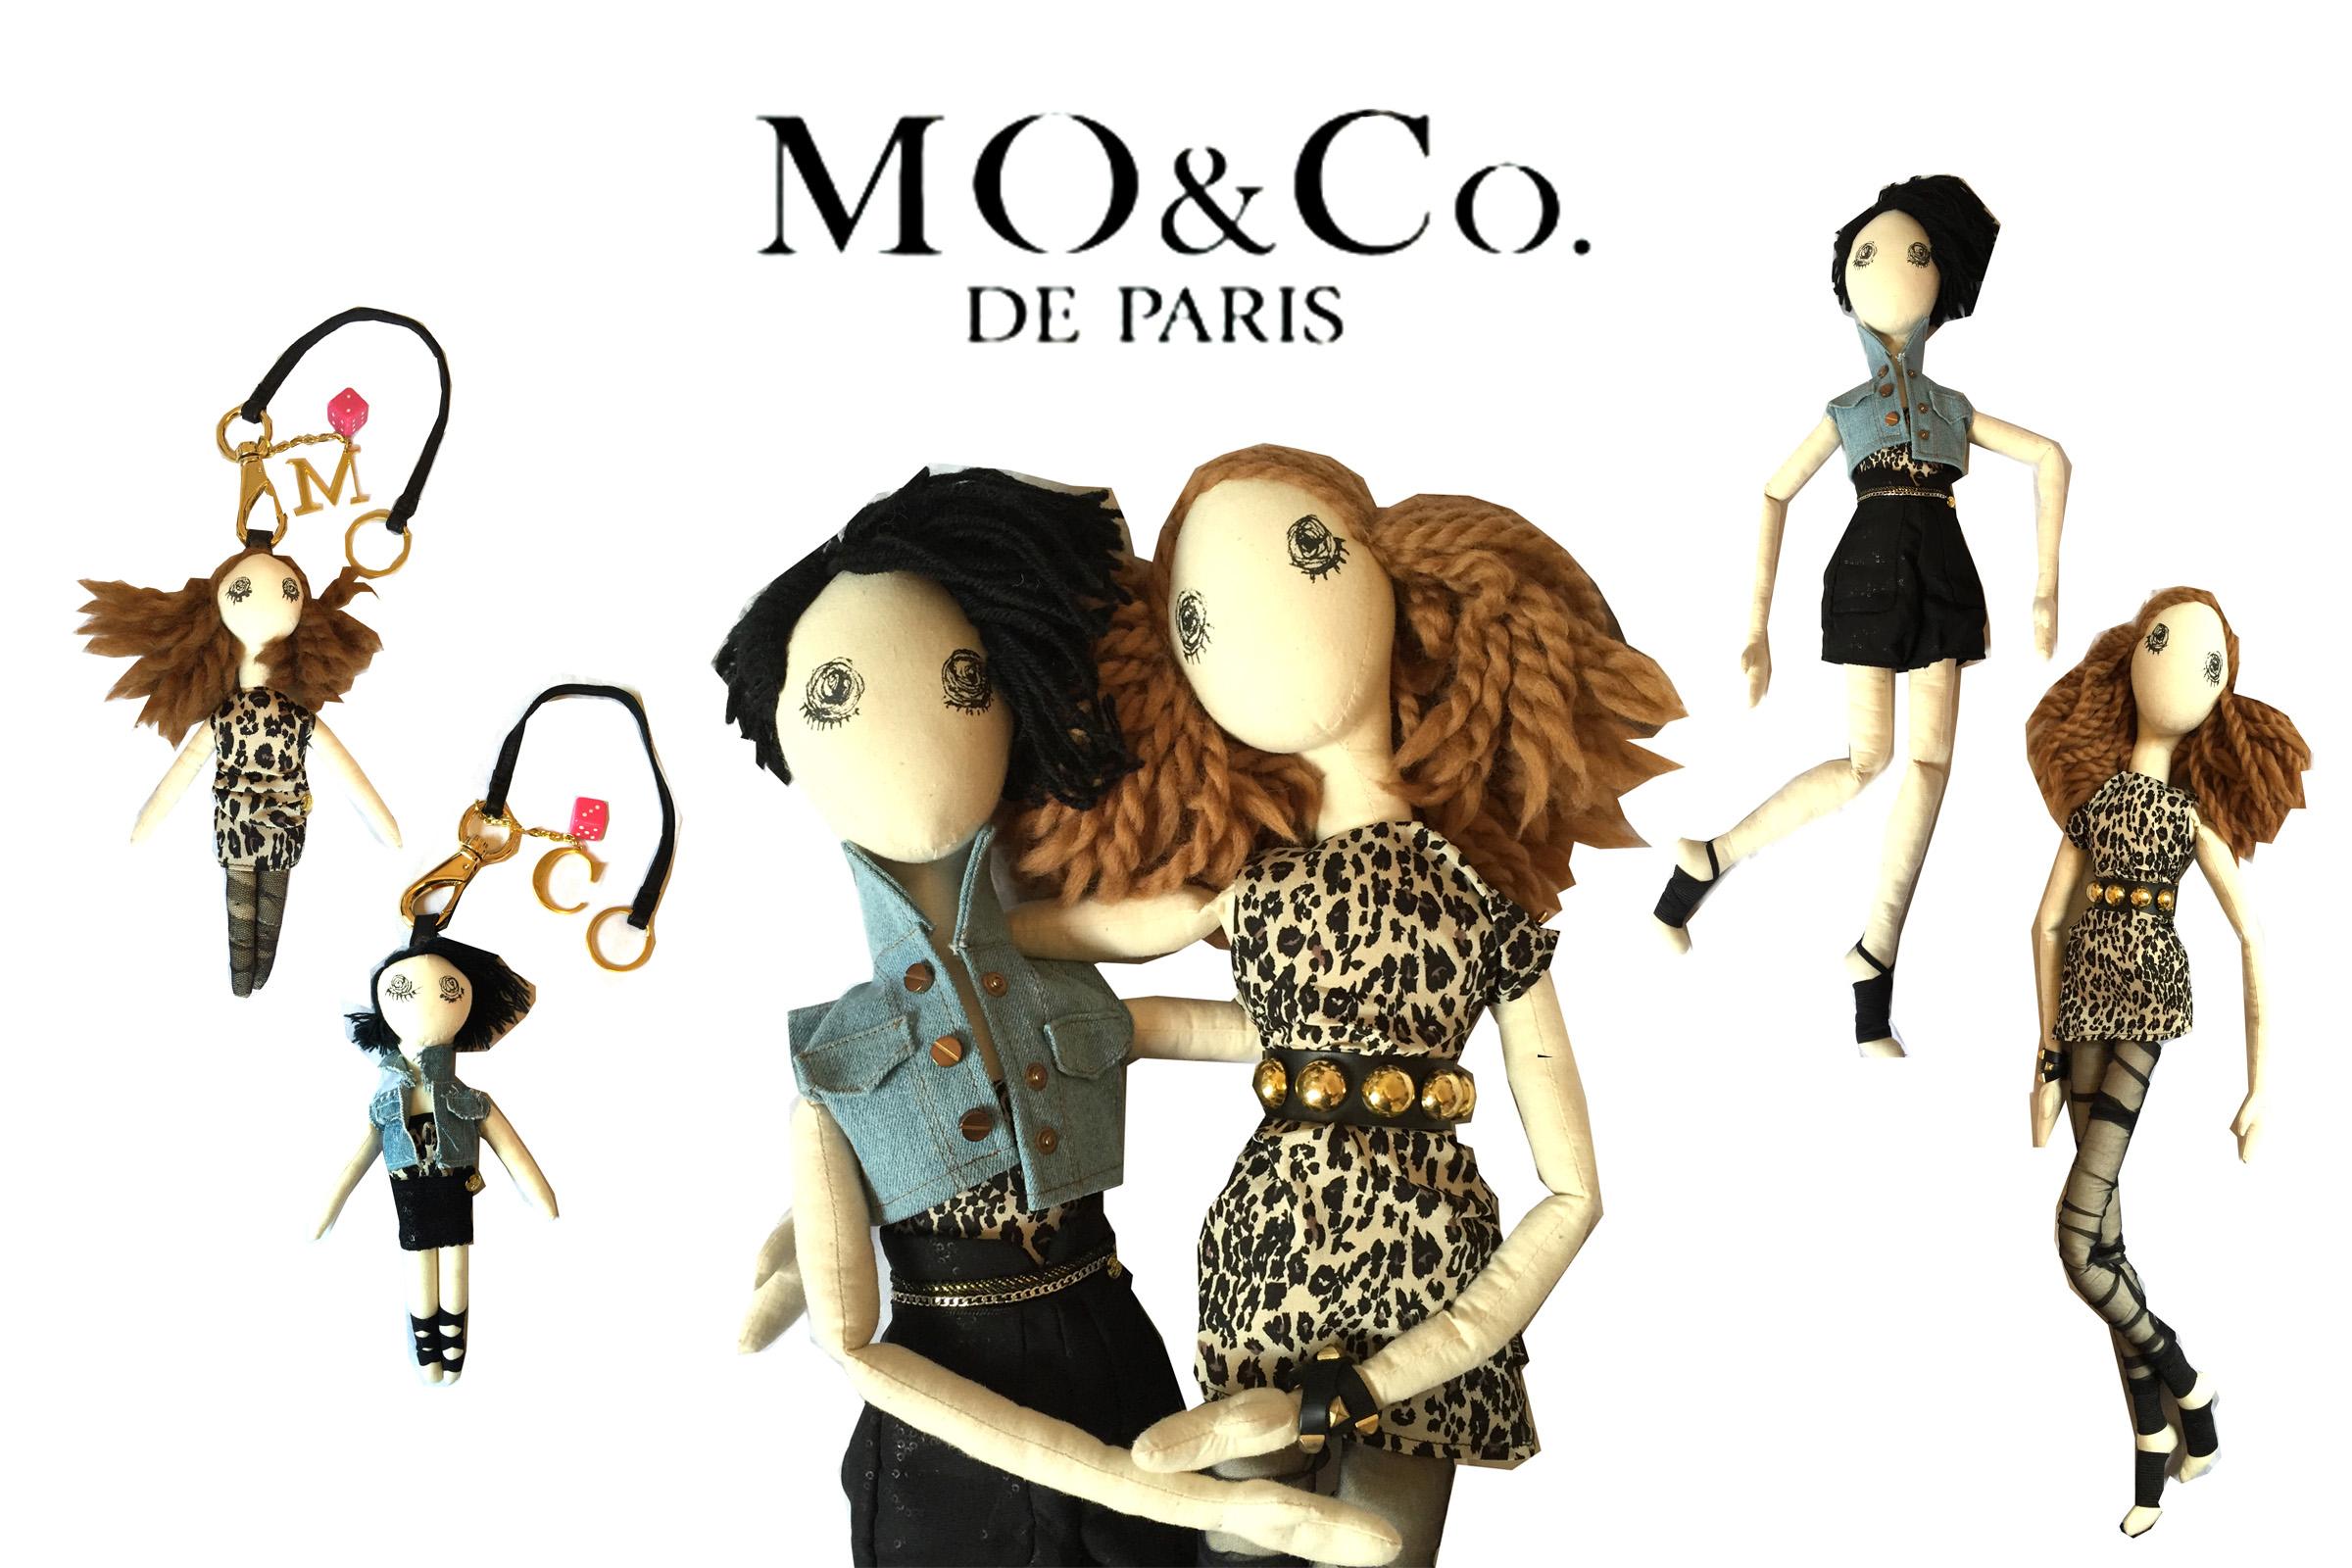 MOCO1.jpg